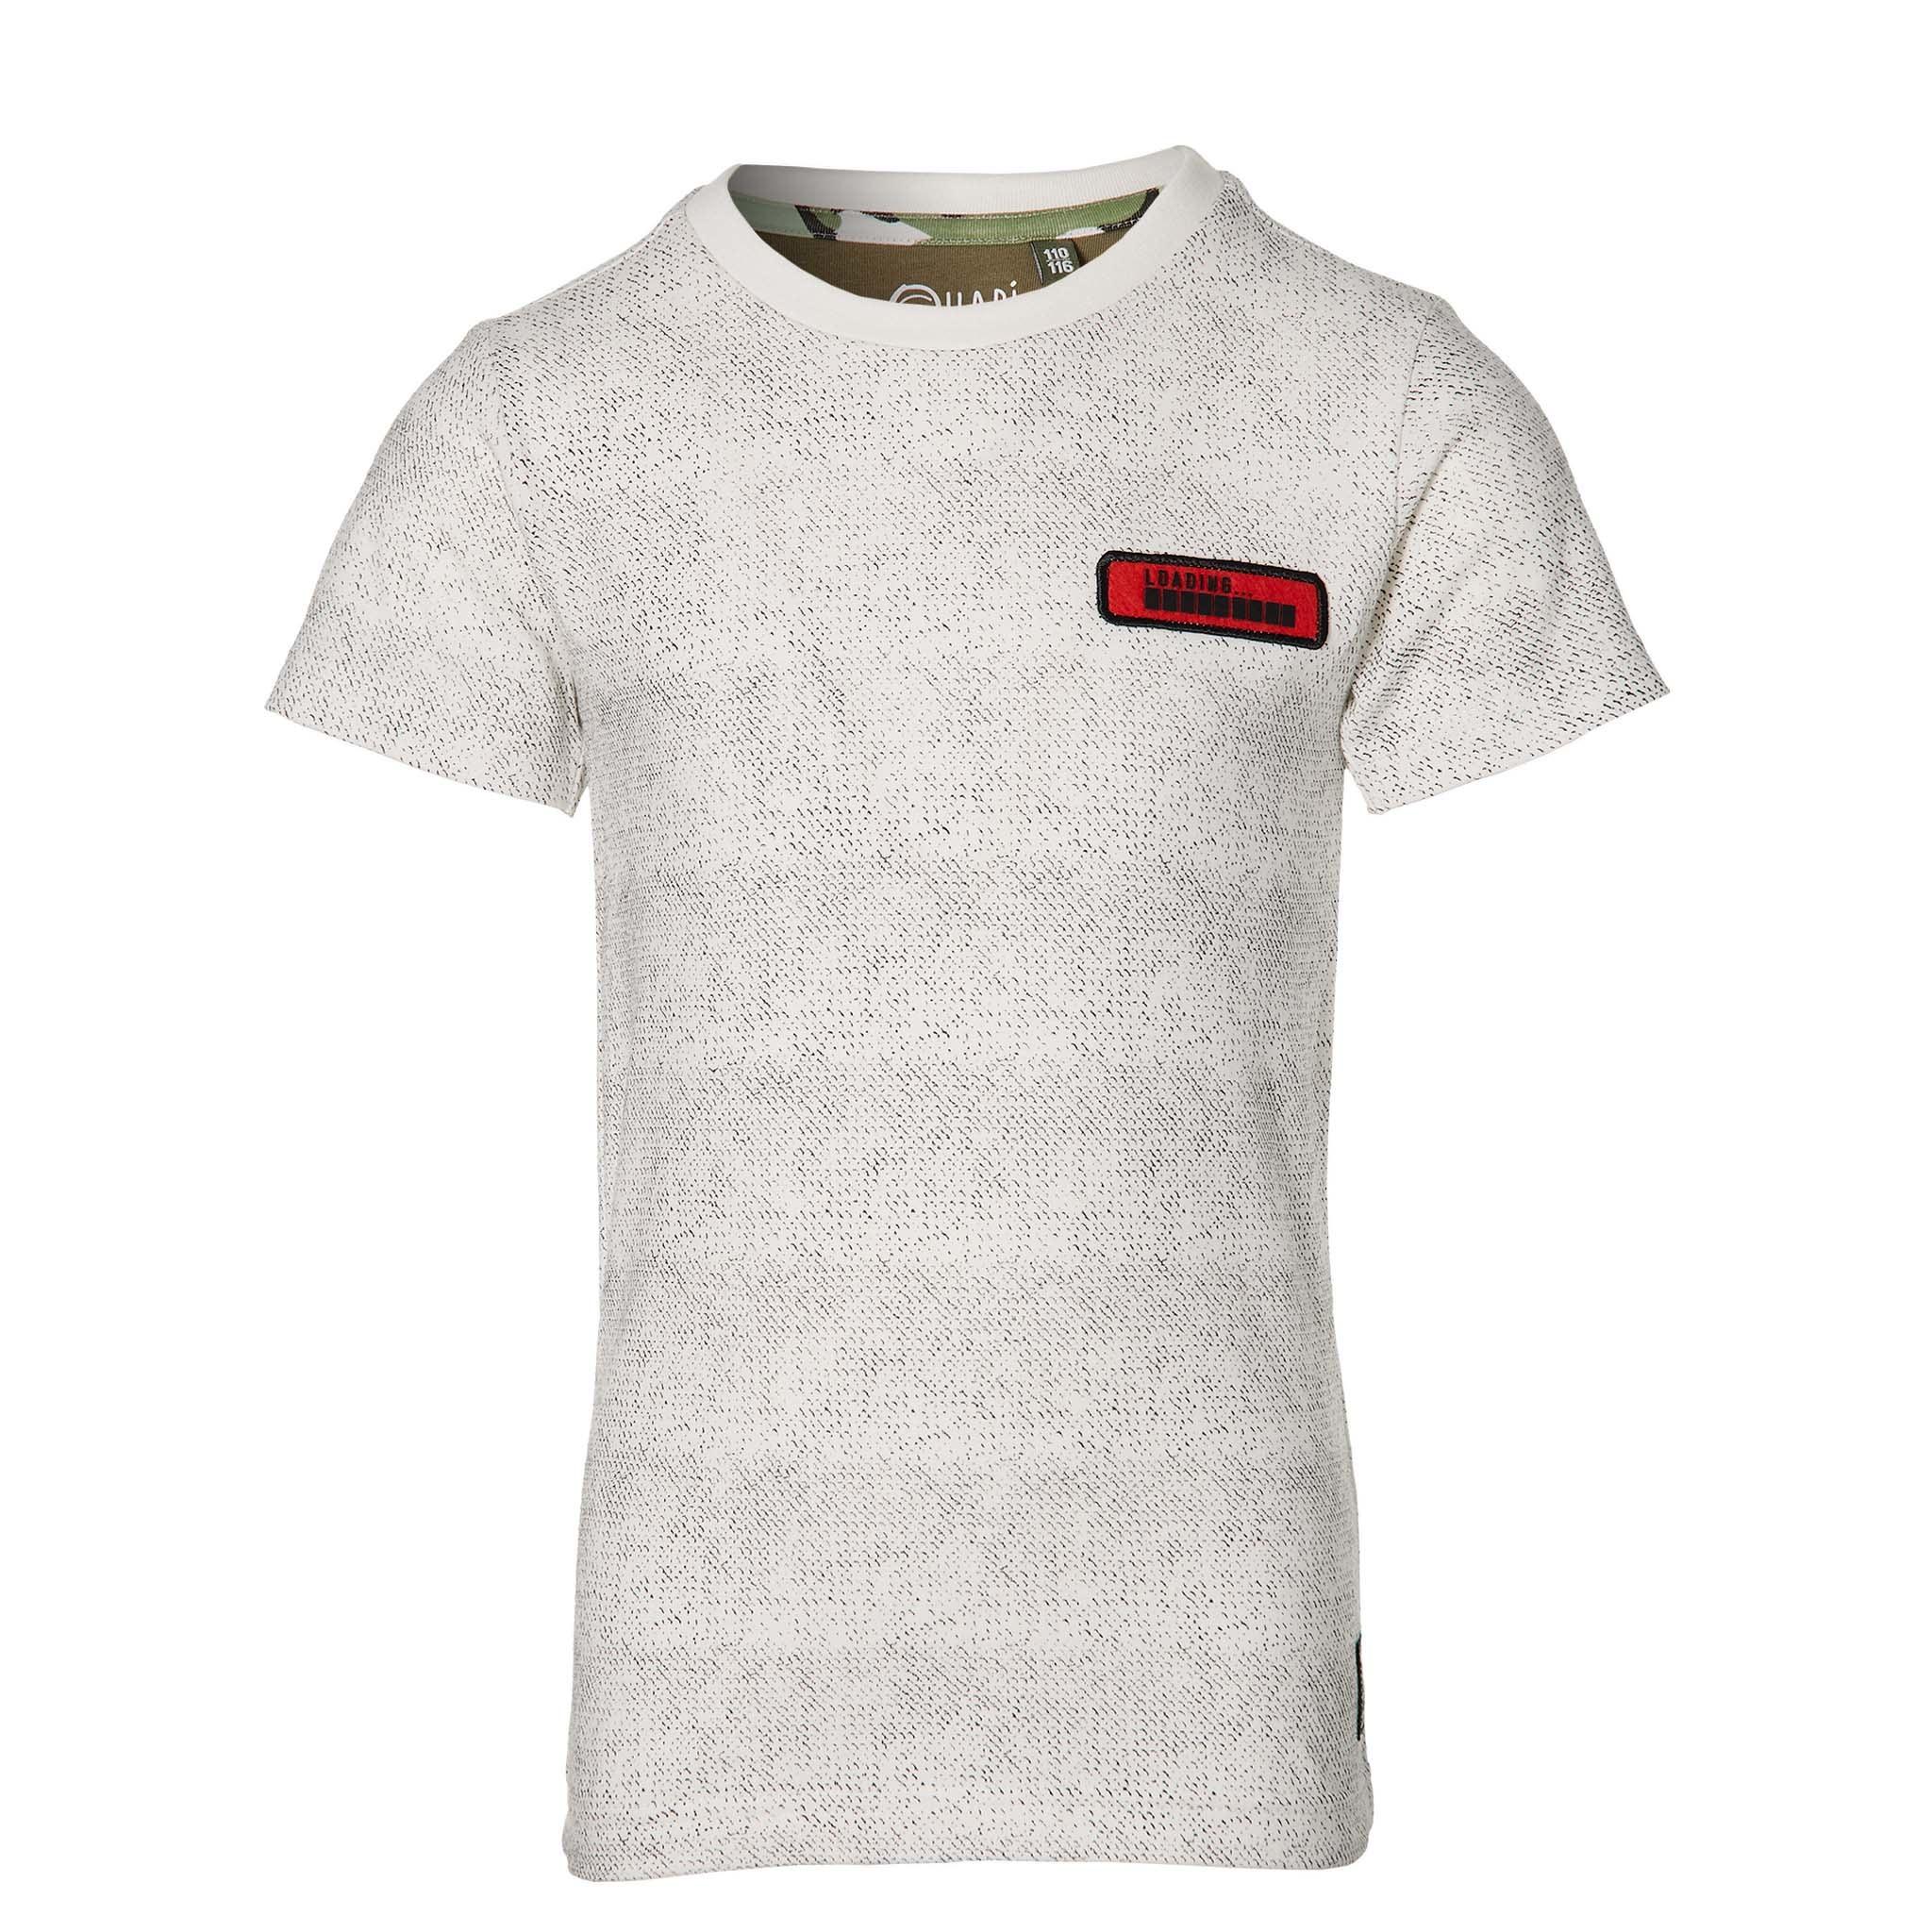 jongens T-shirt Fabian of white grunge